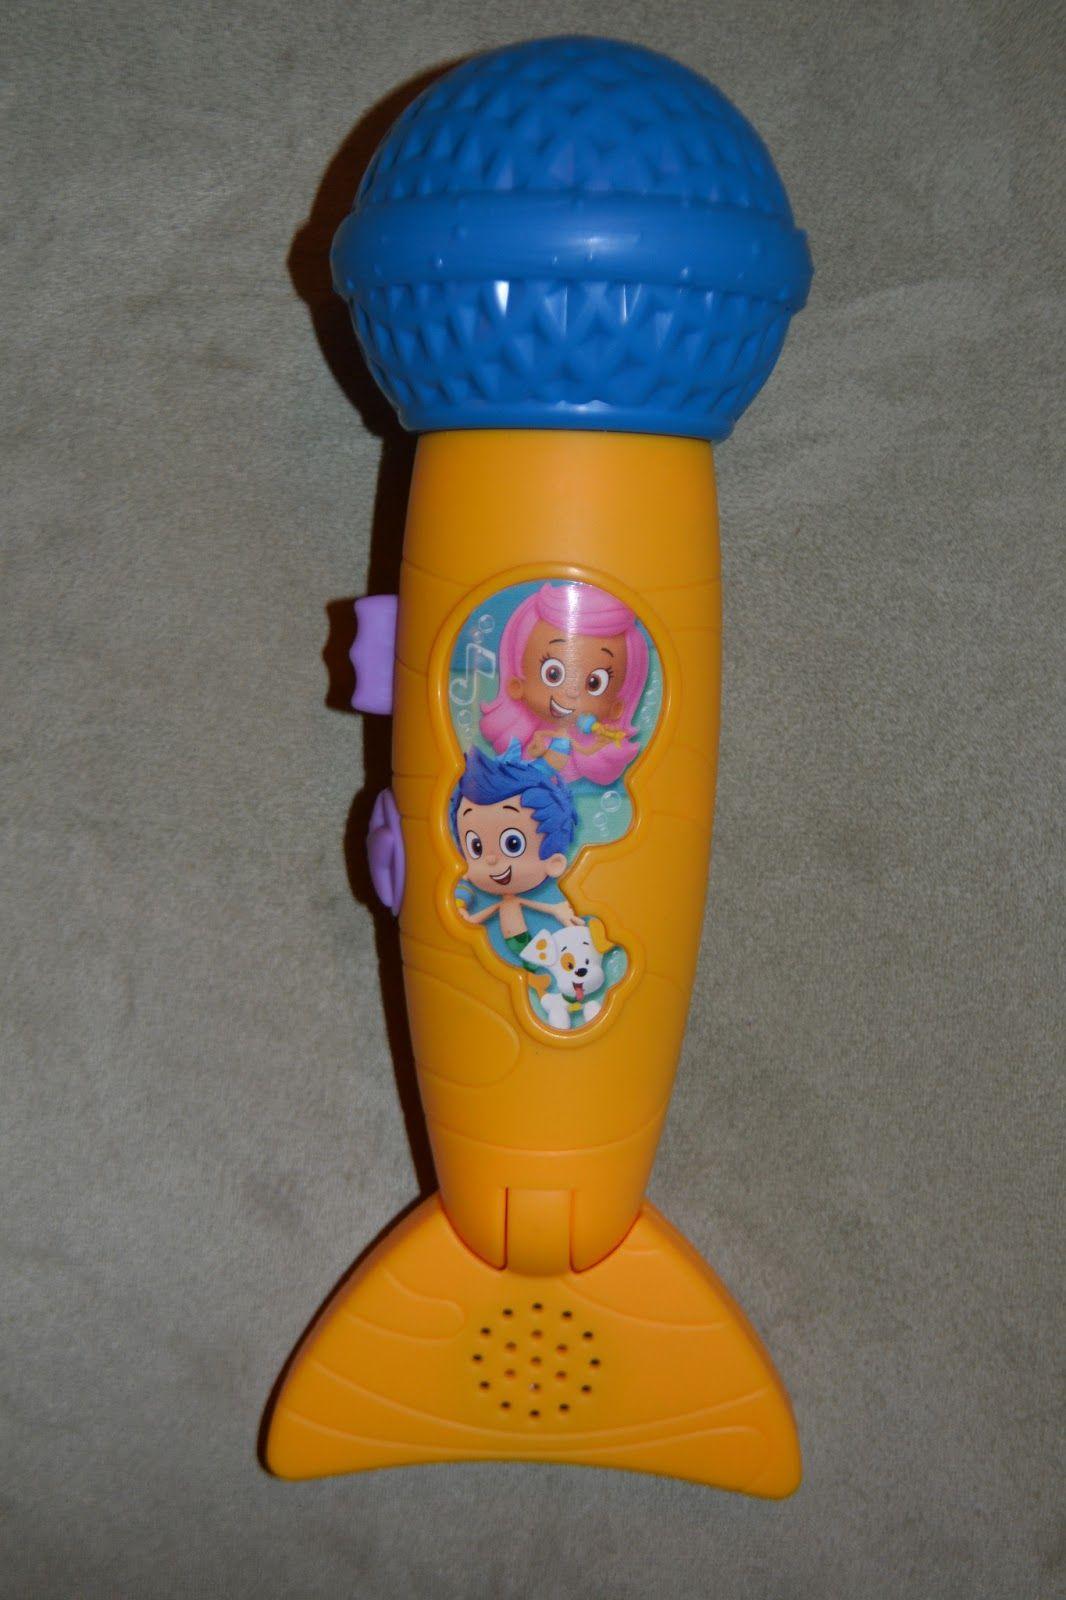 bubble guppies toys - Google Search & bubble guppies toys - Google Search | Toys * Games * Stuffed ...